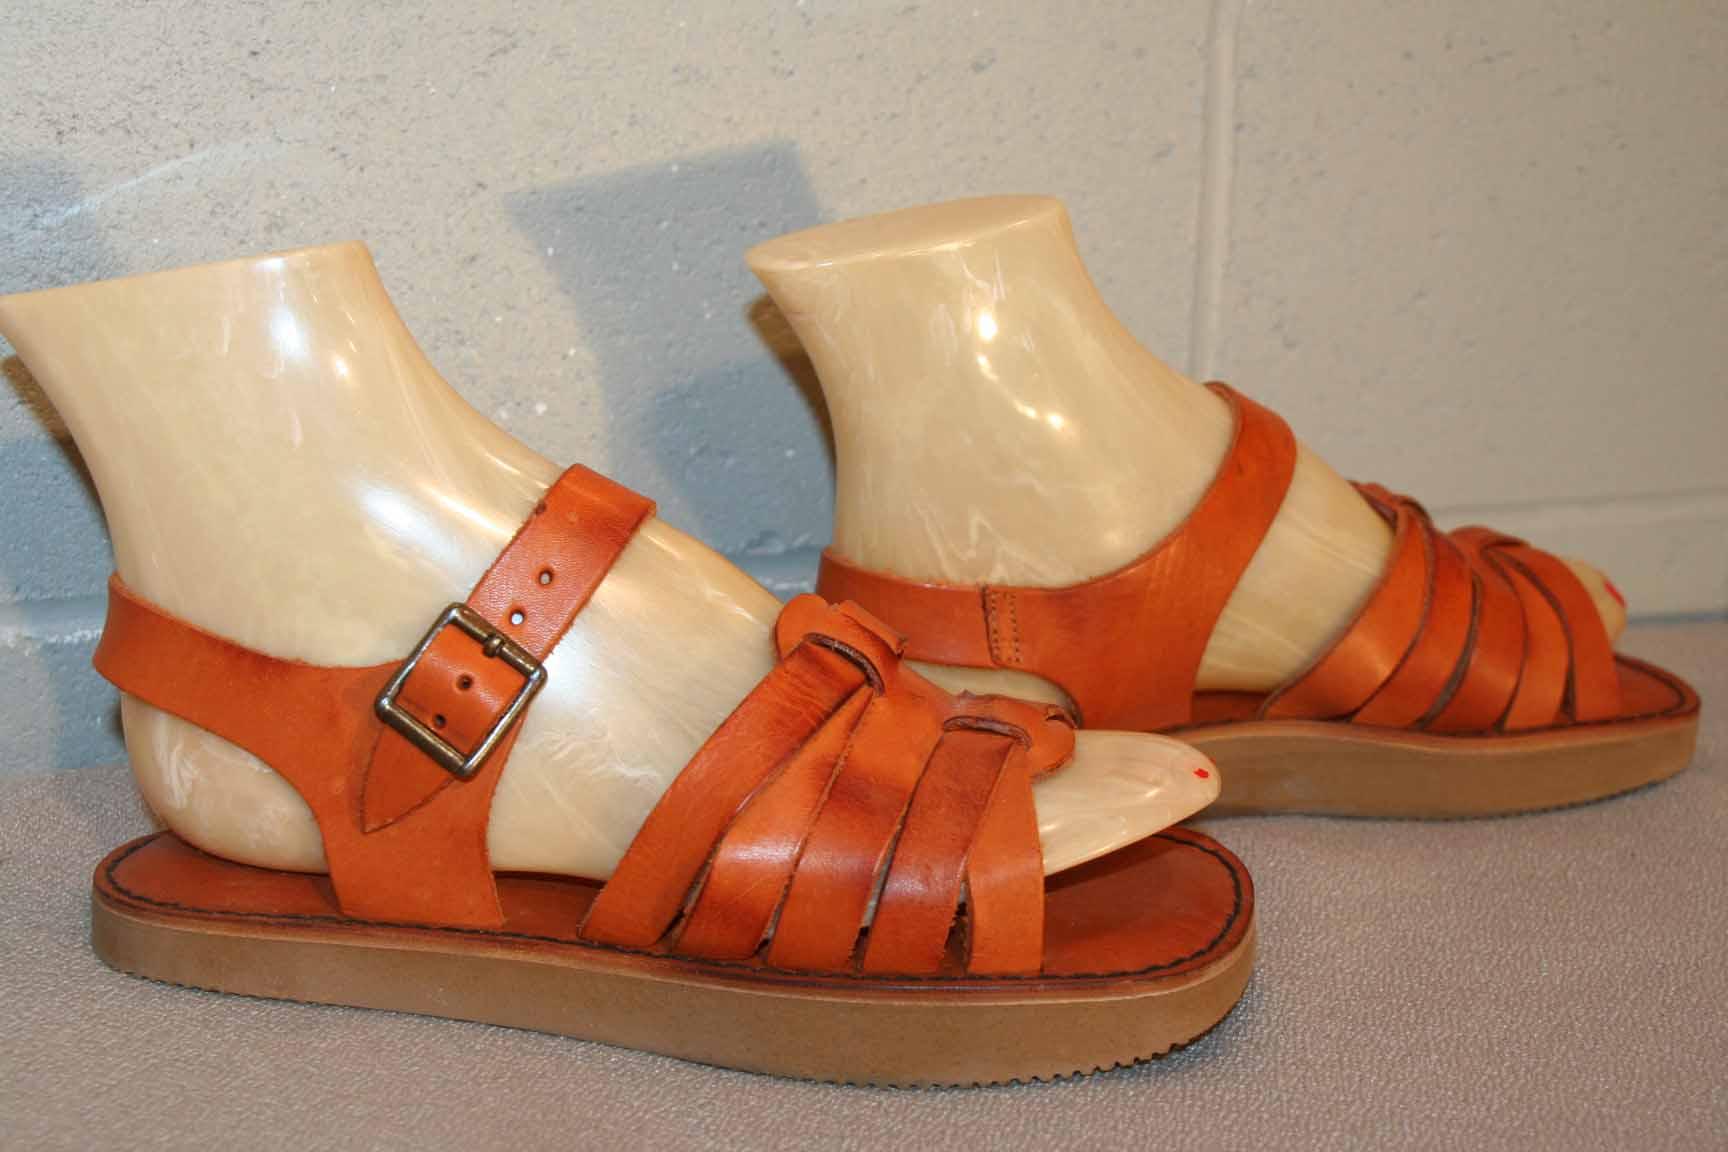 42b4f73a3365 6.5 B NOS Vtg 70s RUST BROWN FLAT HEEL HIPPIE BOHO FESTIVAL SANDAL New Shoe